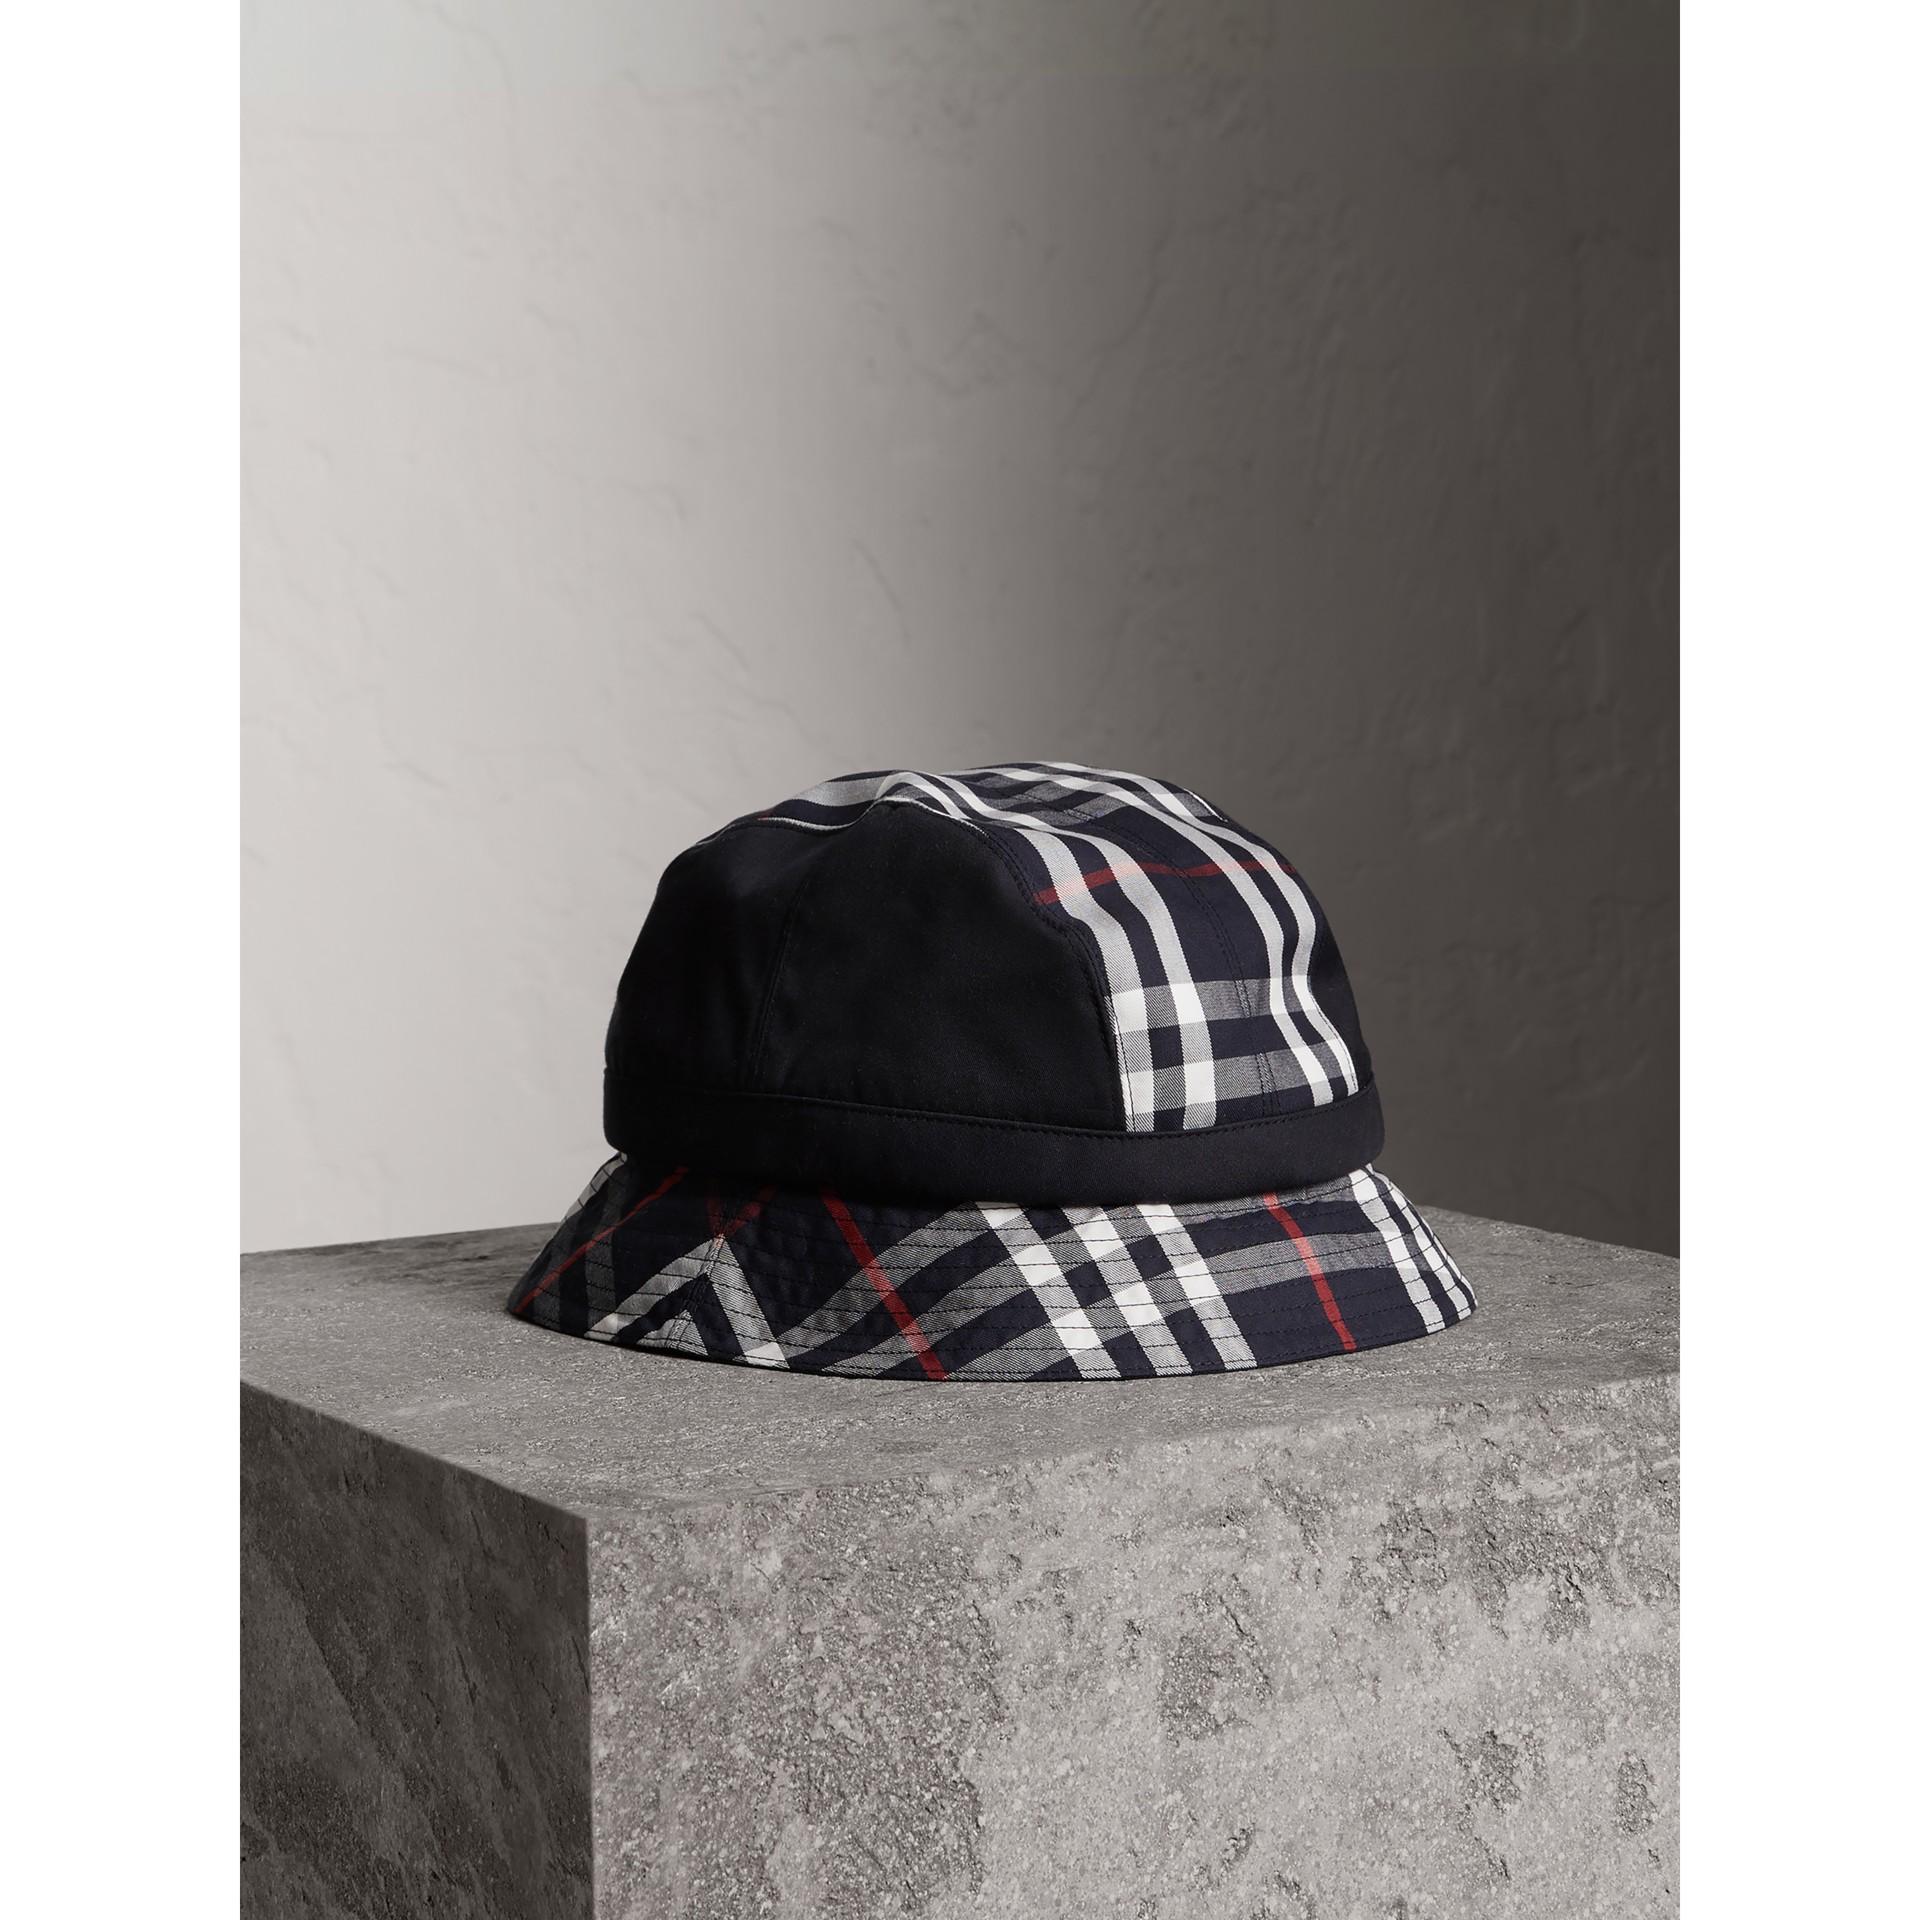 Burberry Gosha X Bucket Hat In Navy. First seen in Jan 2018. 1 6 af012b618b5